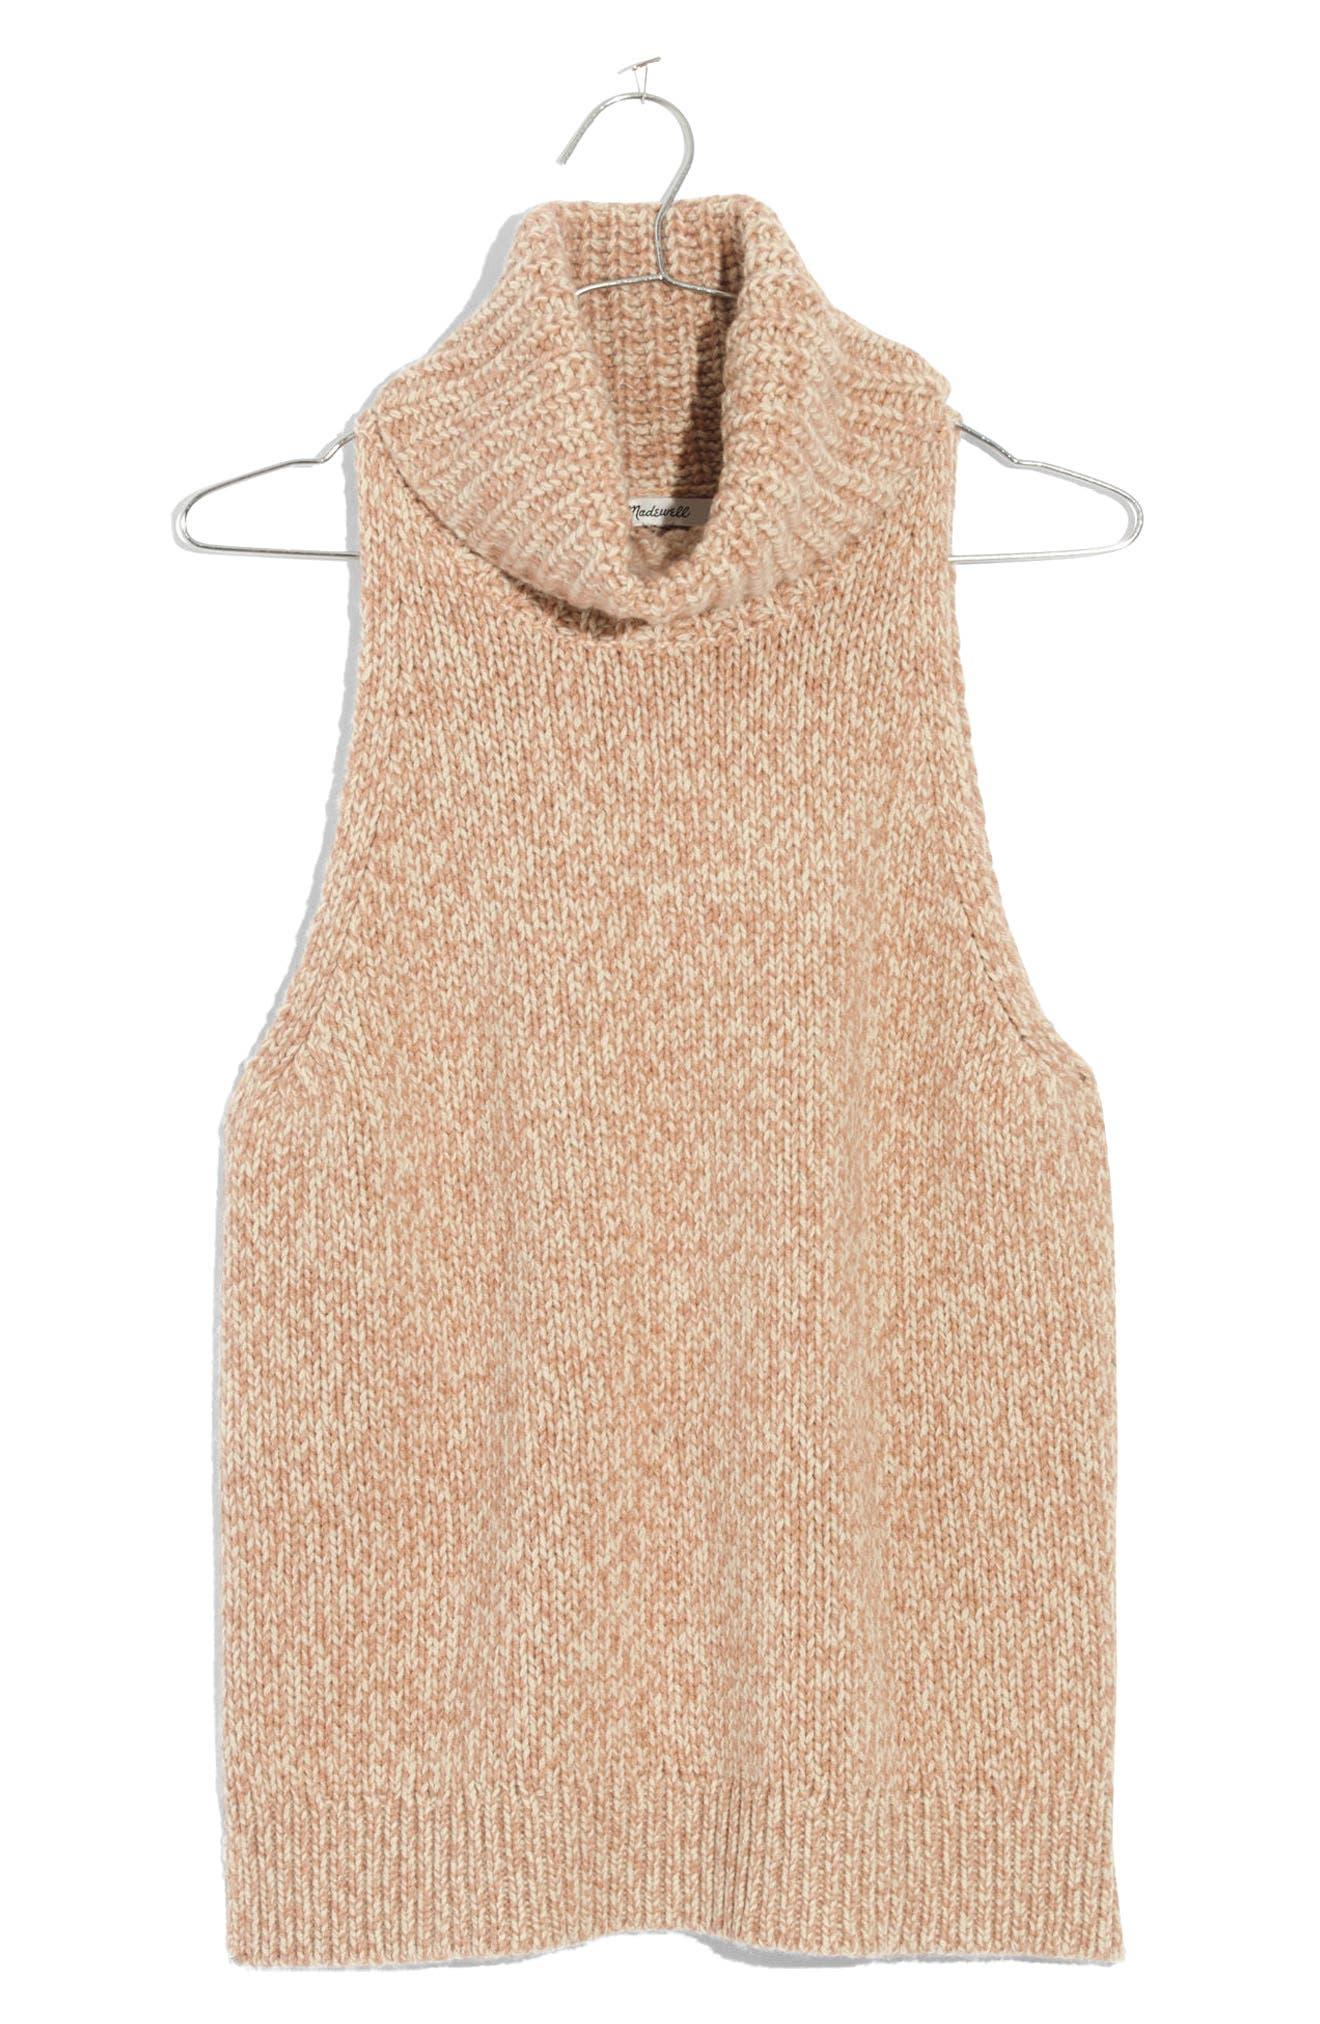 Madewell Marled Sleeveless Turtleneck Sweater